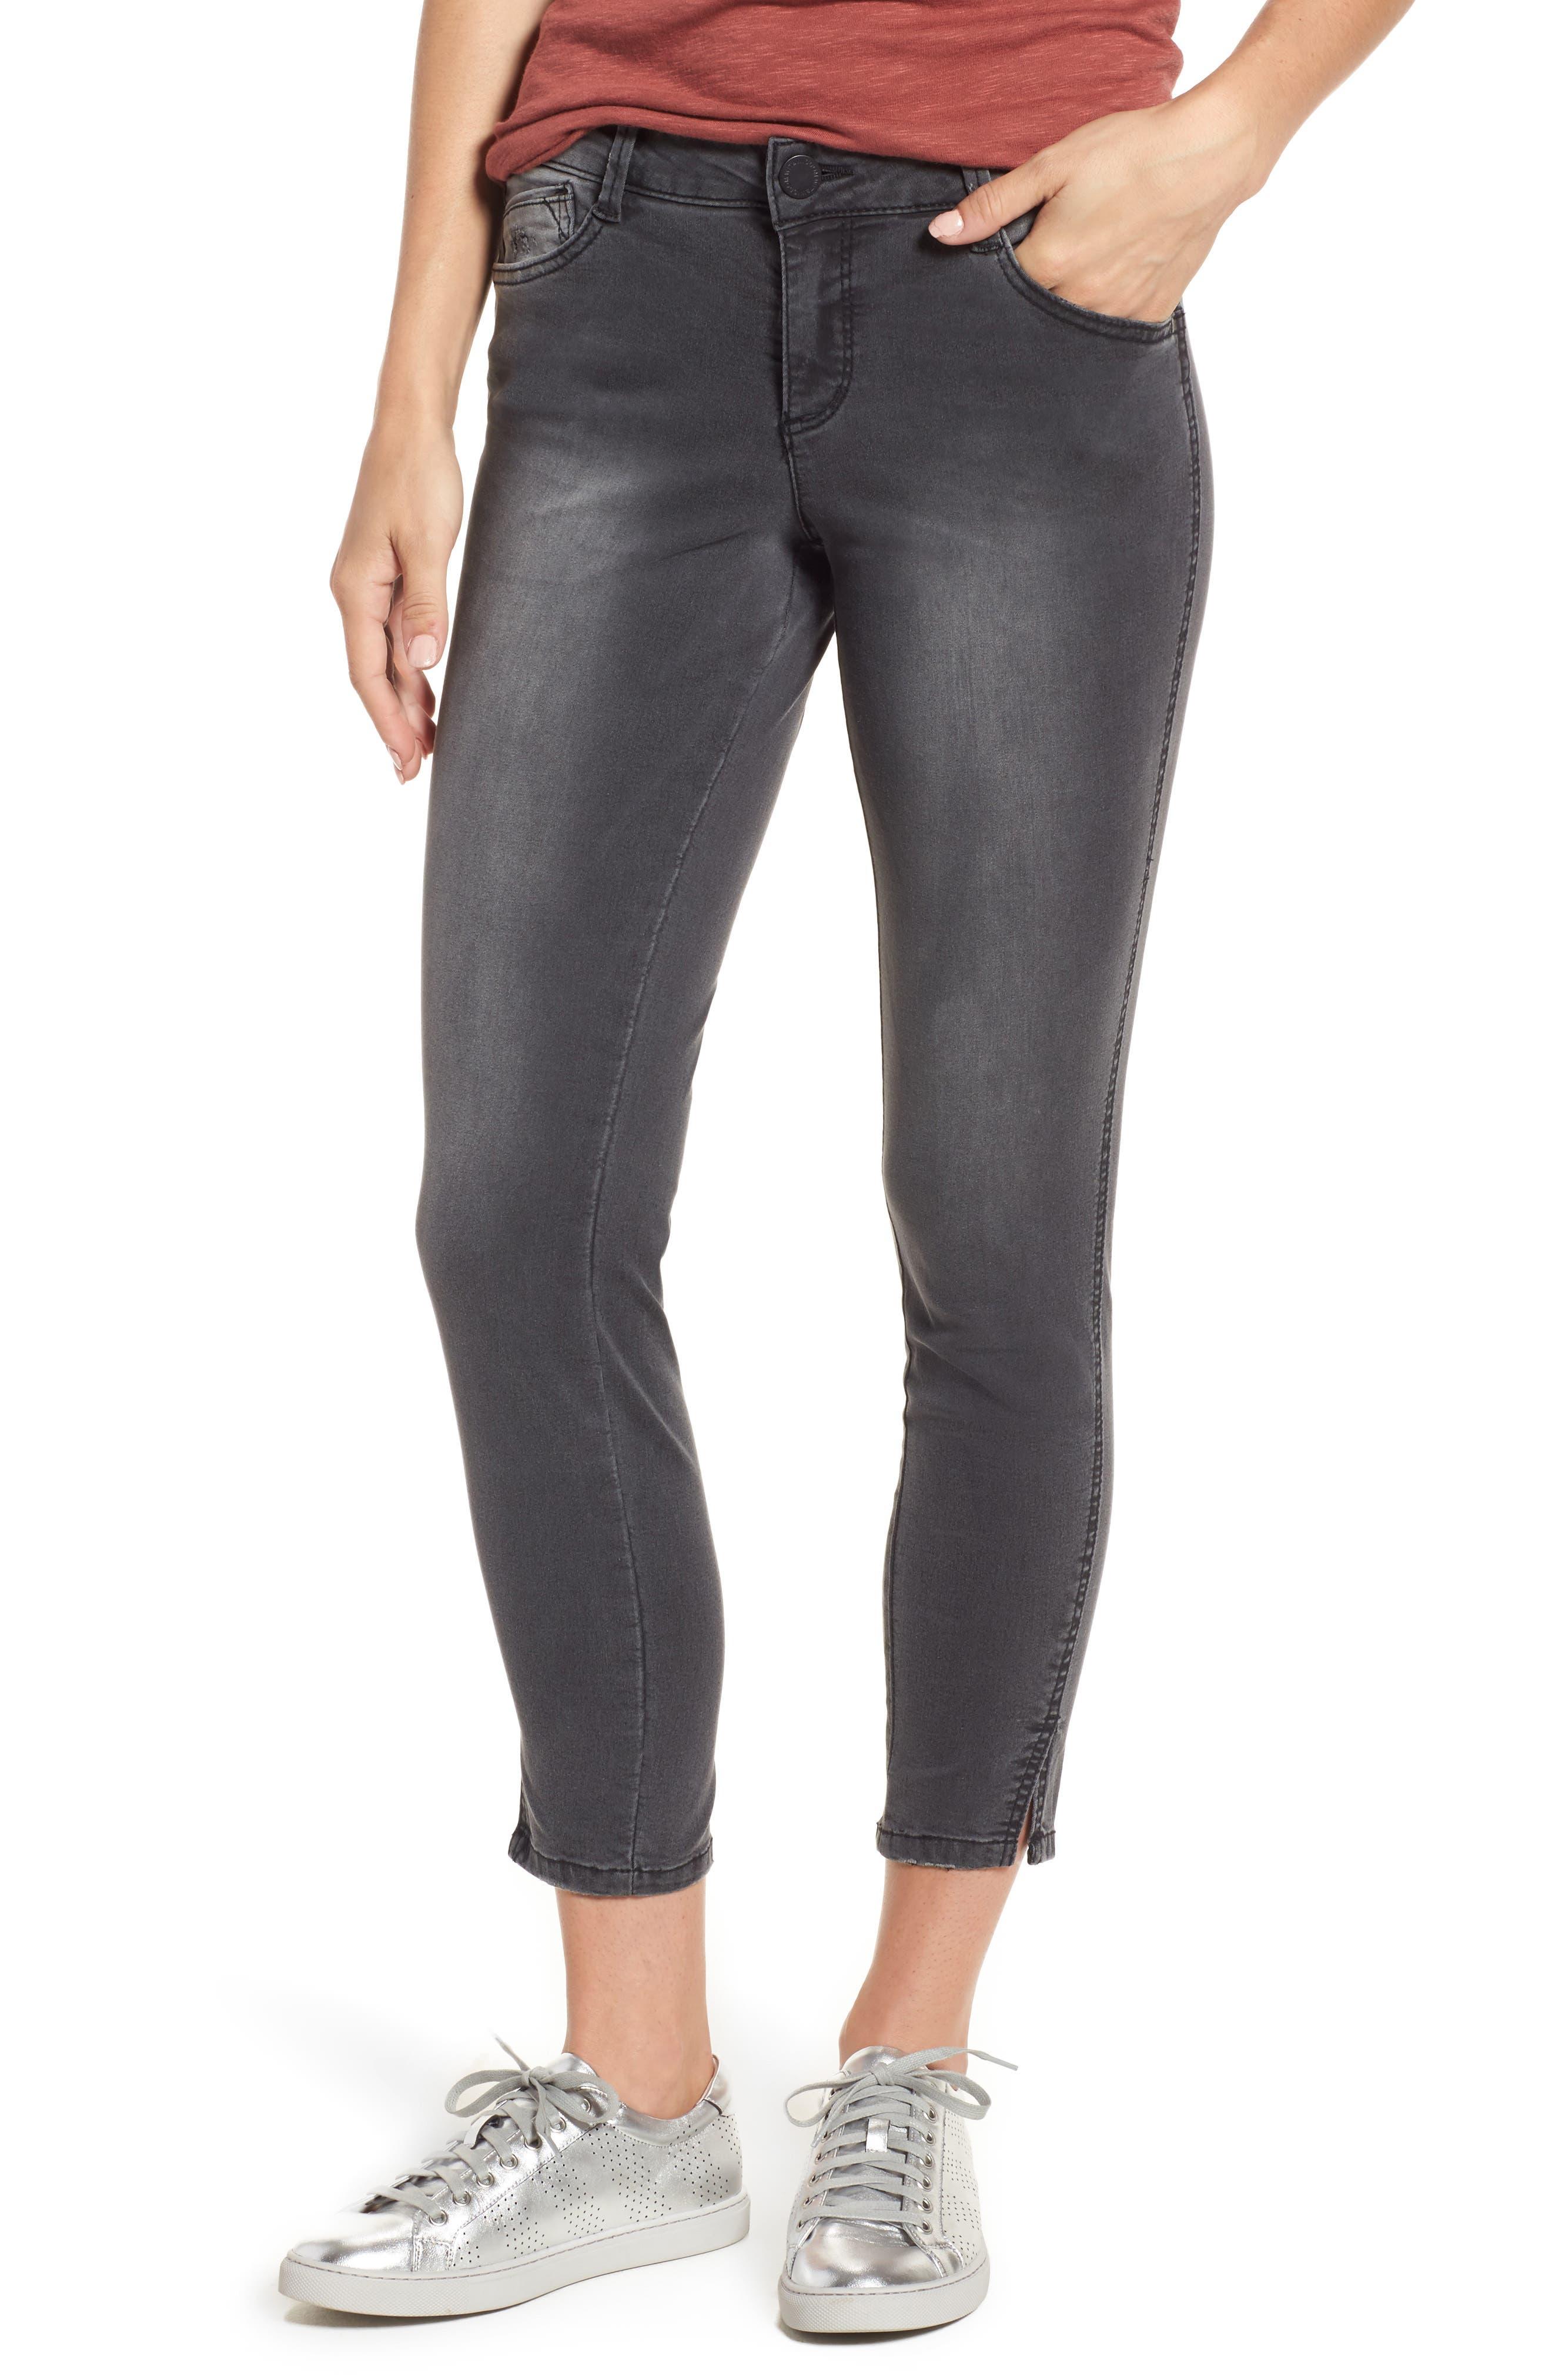 Wit & Wisdom Slit Skinny Ankle Jeans (Nordstrom Exclusive)